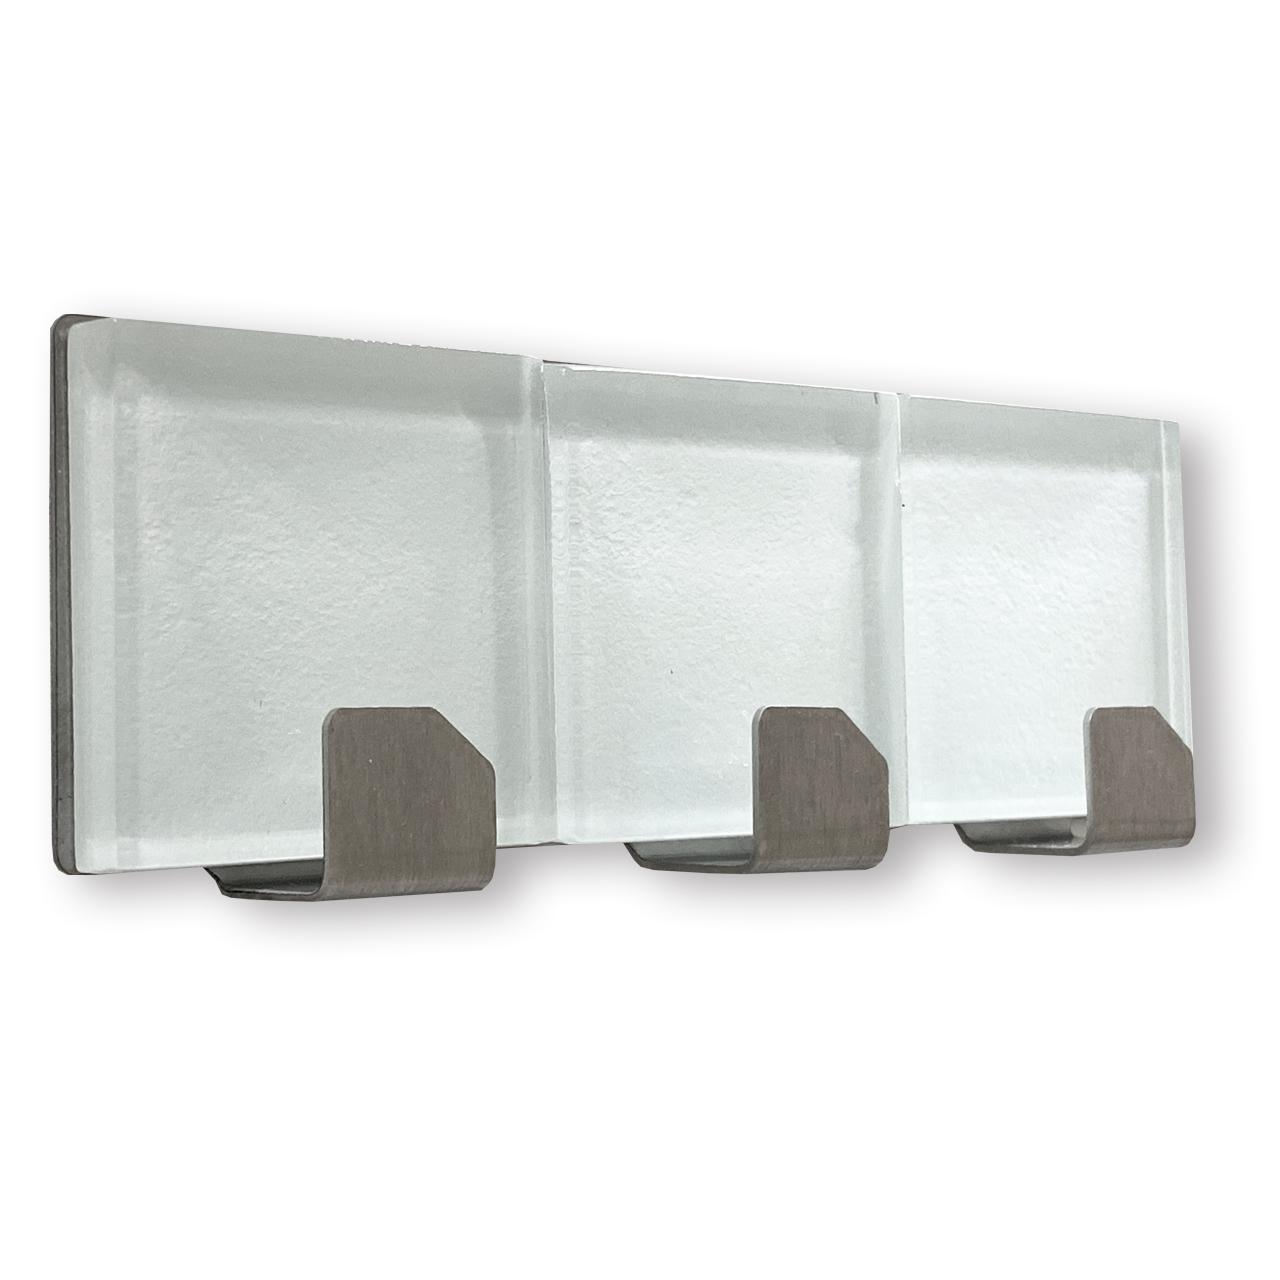 Hakenleiste Edelstahl 3 teilig – DESIGN GLAS, selbstklebend